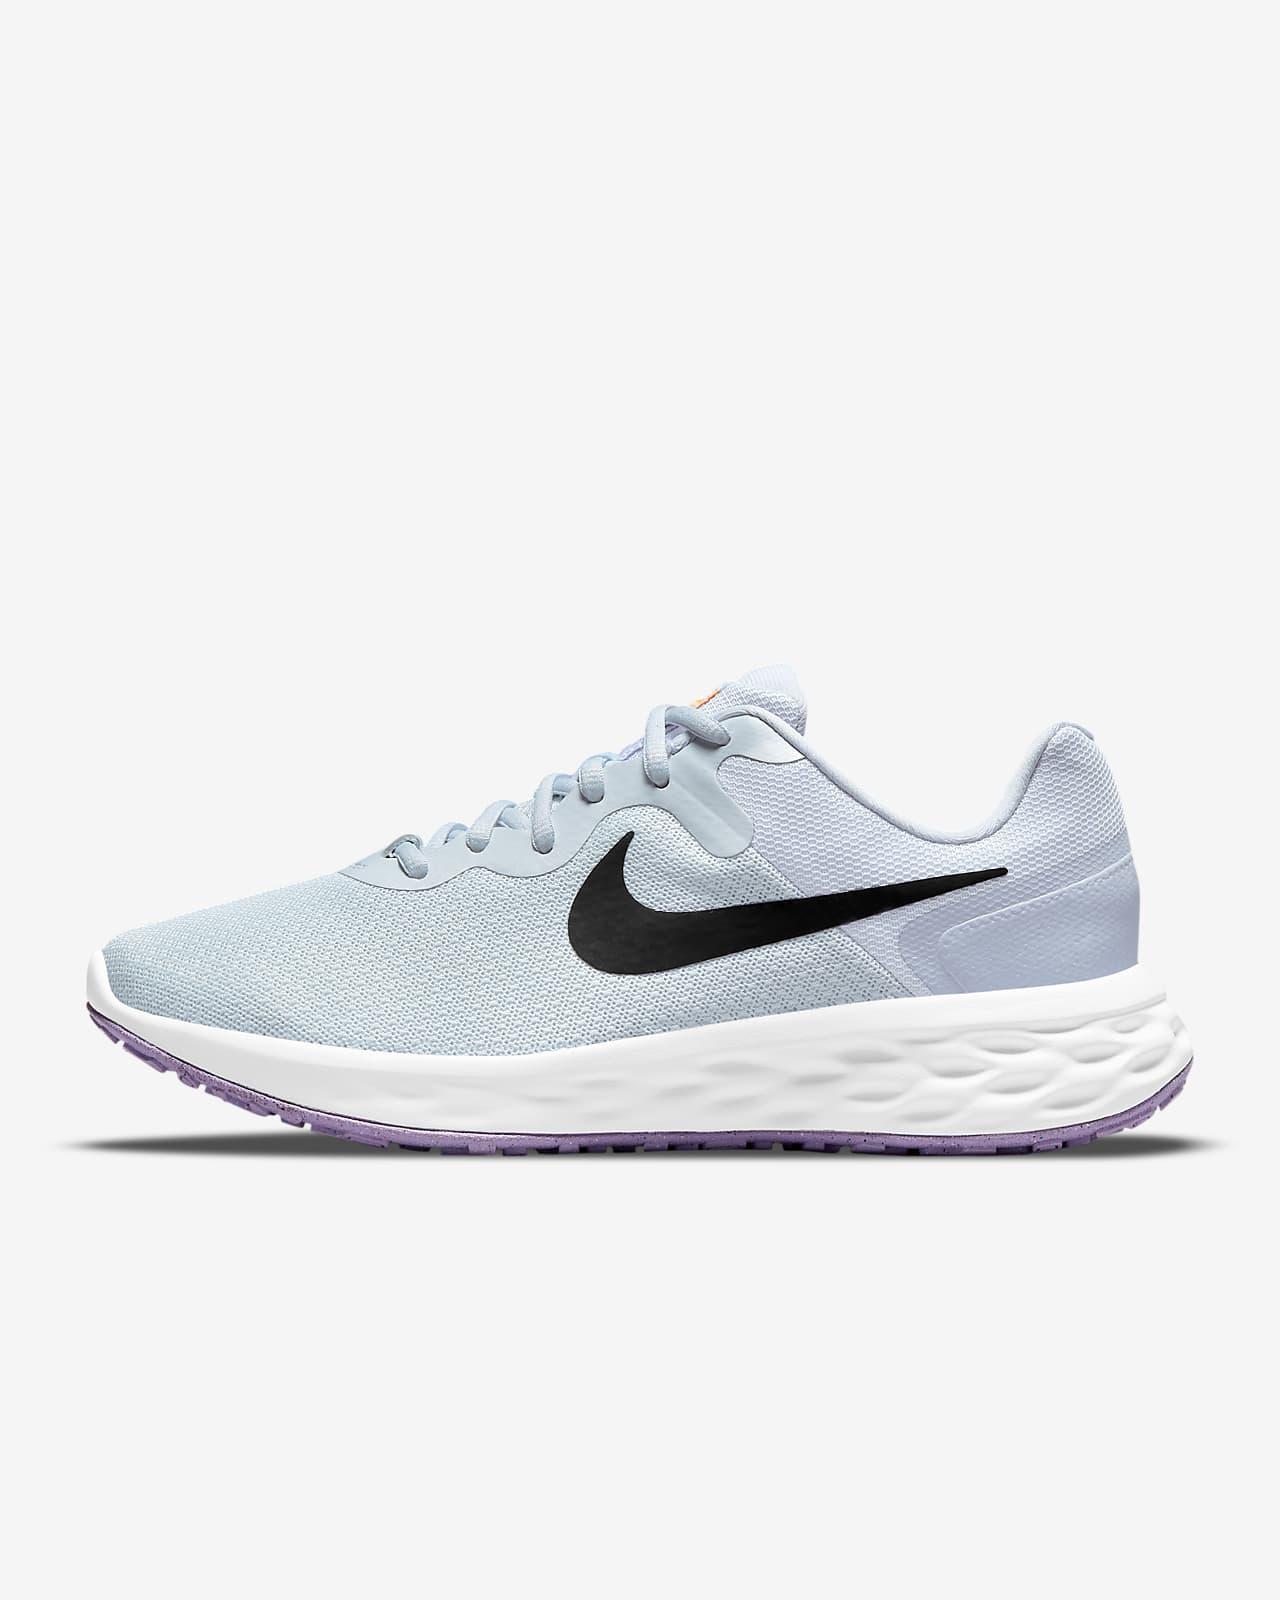 Nike Revolution 6 Next Nature Women's Road Running Shoes